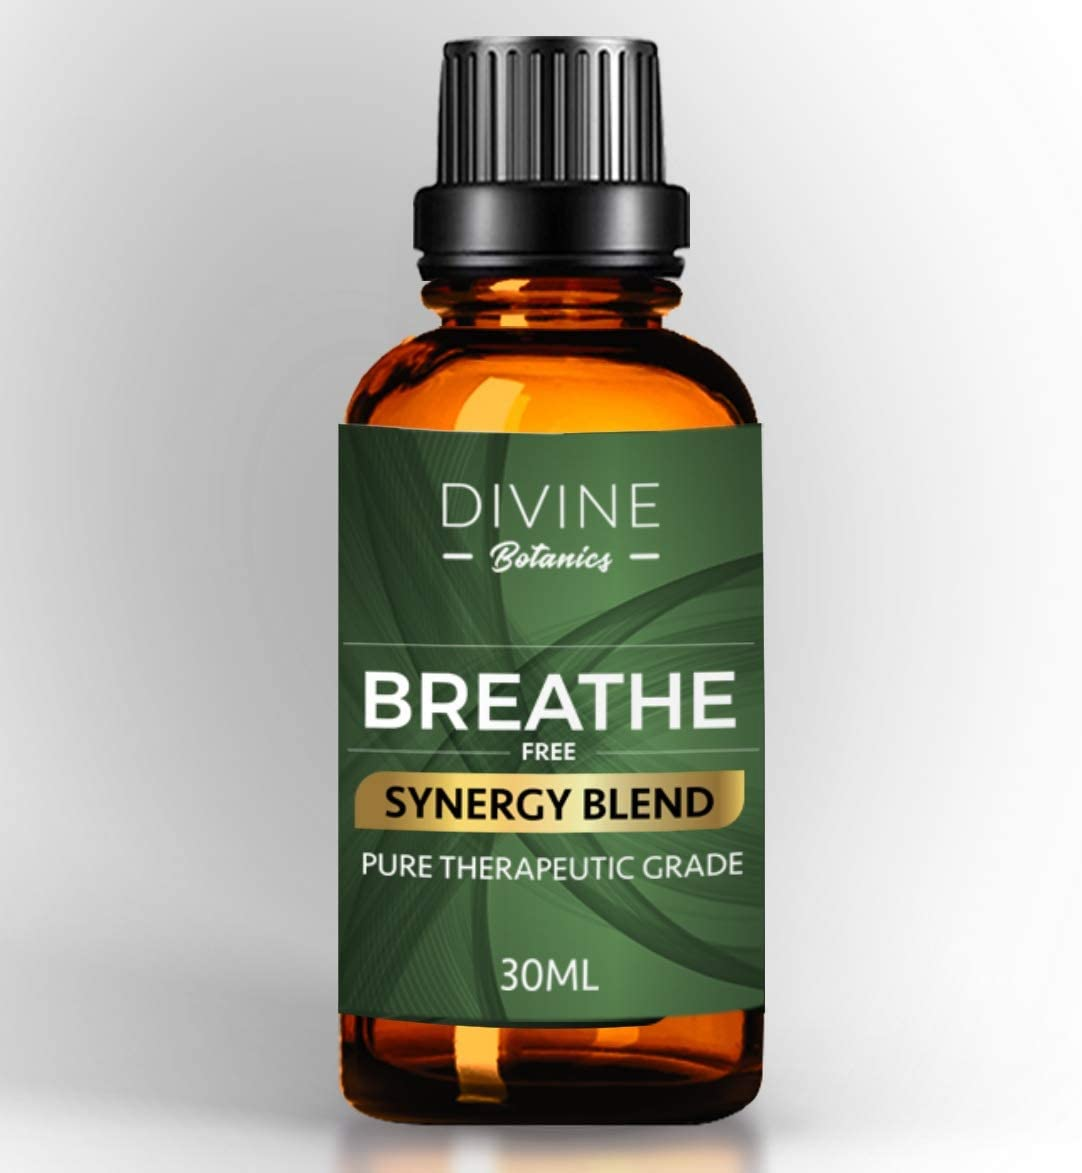 Divine Botanics Breathe Free